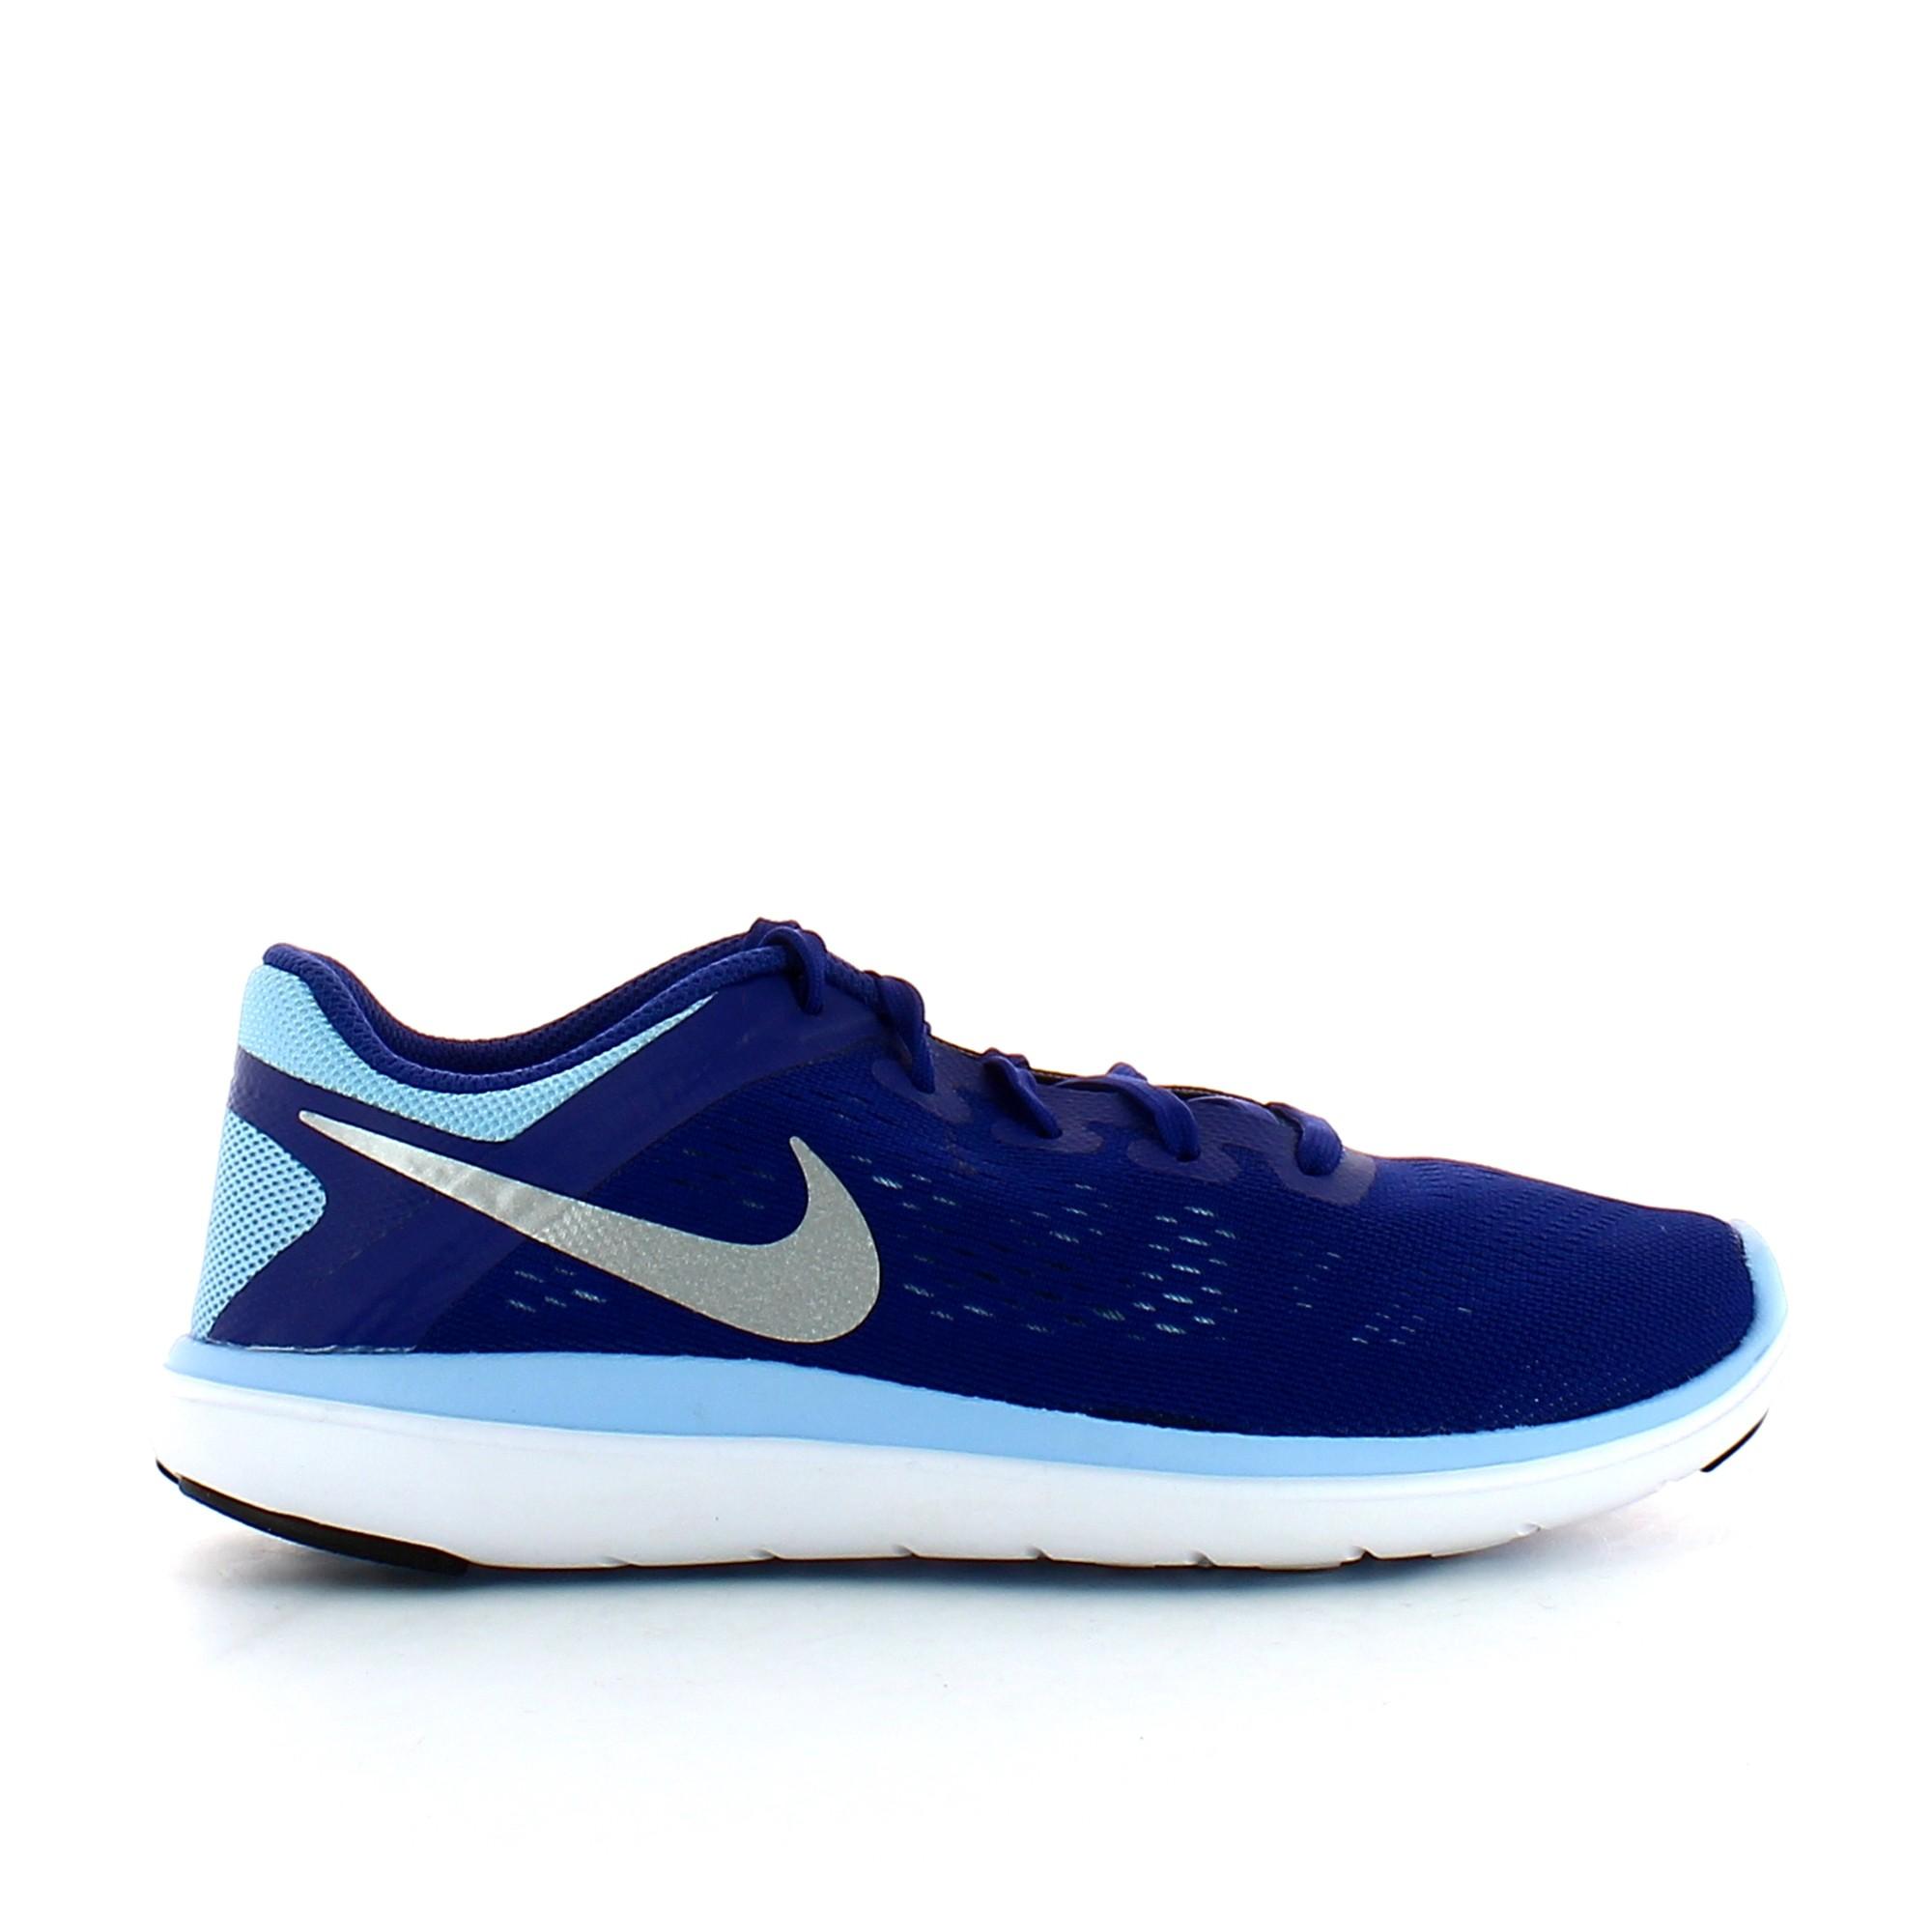 9117299 azul zapatos para correr nike negro 2016 flex